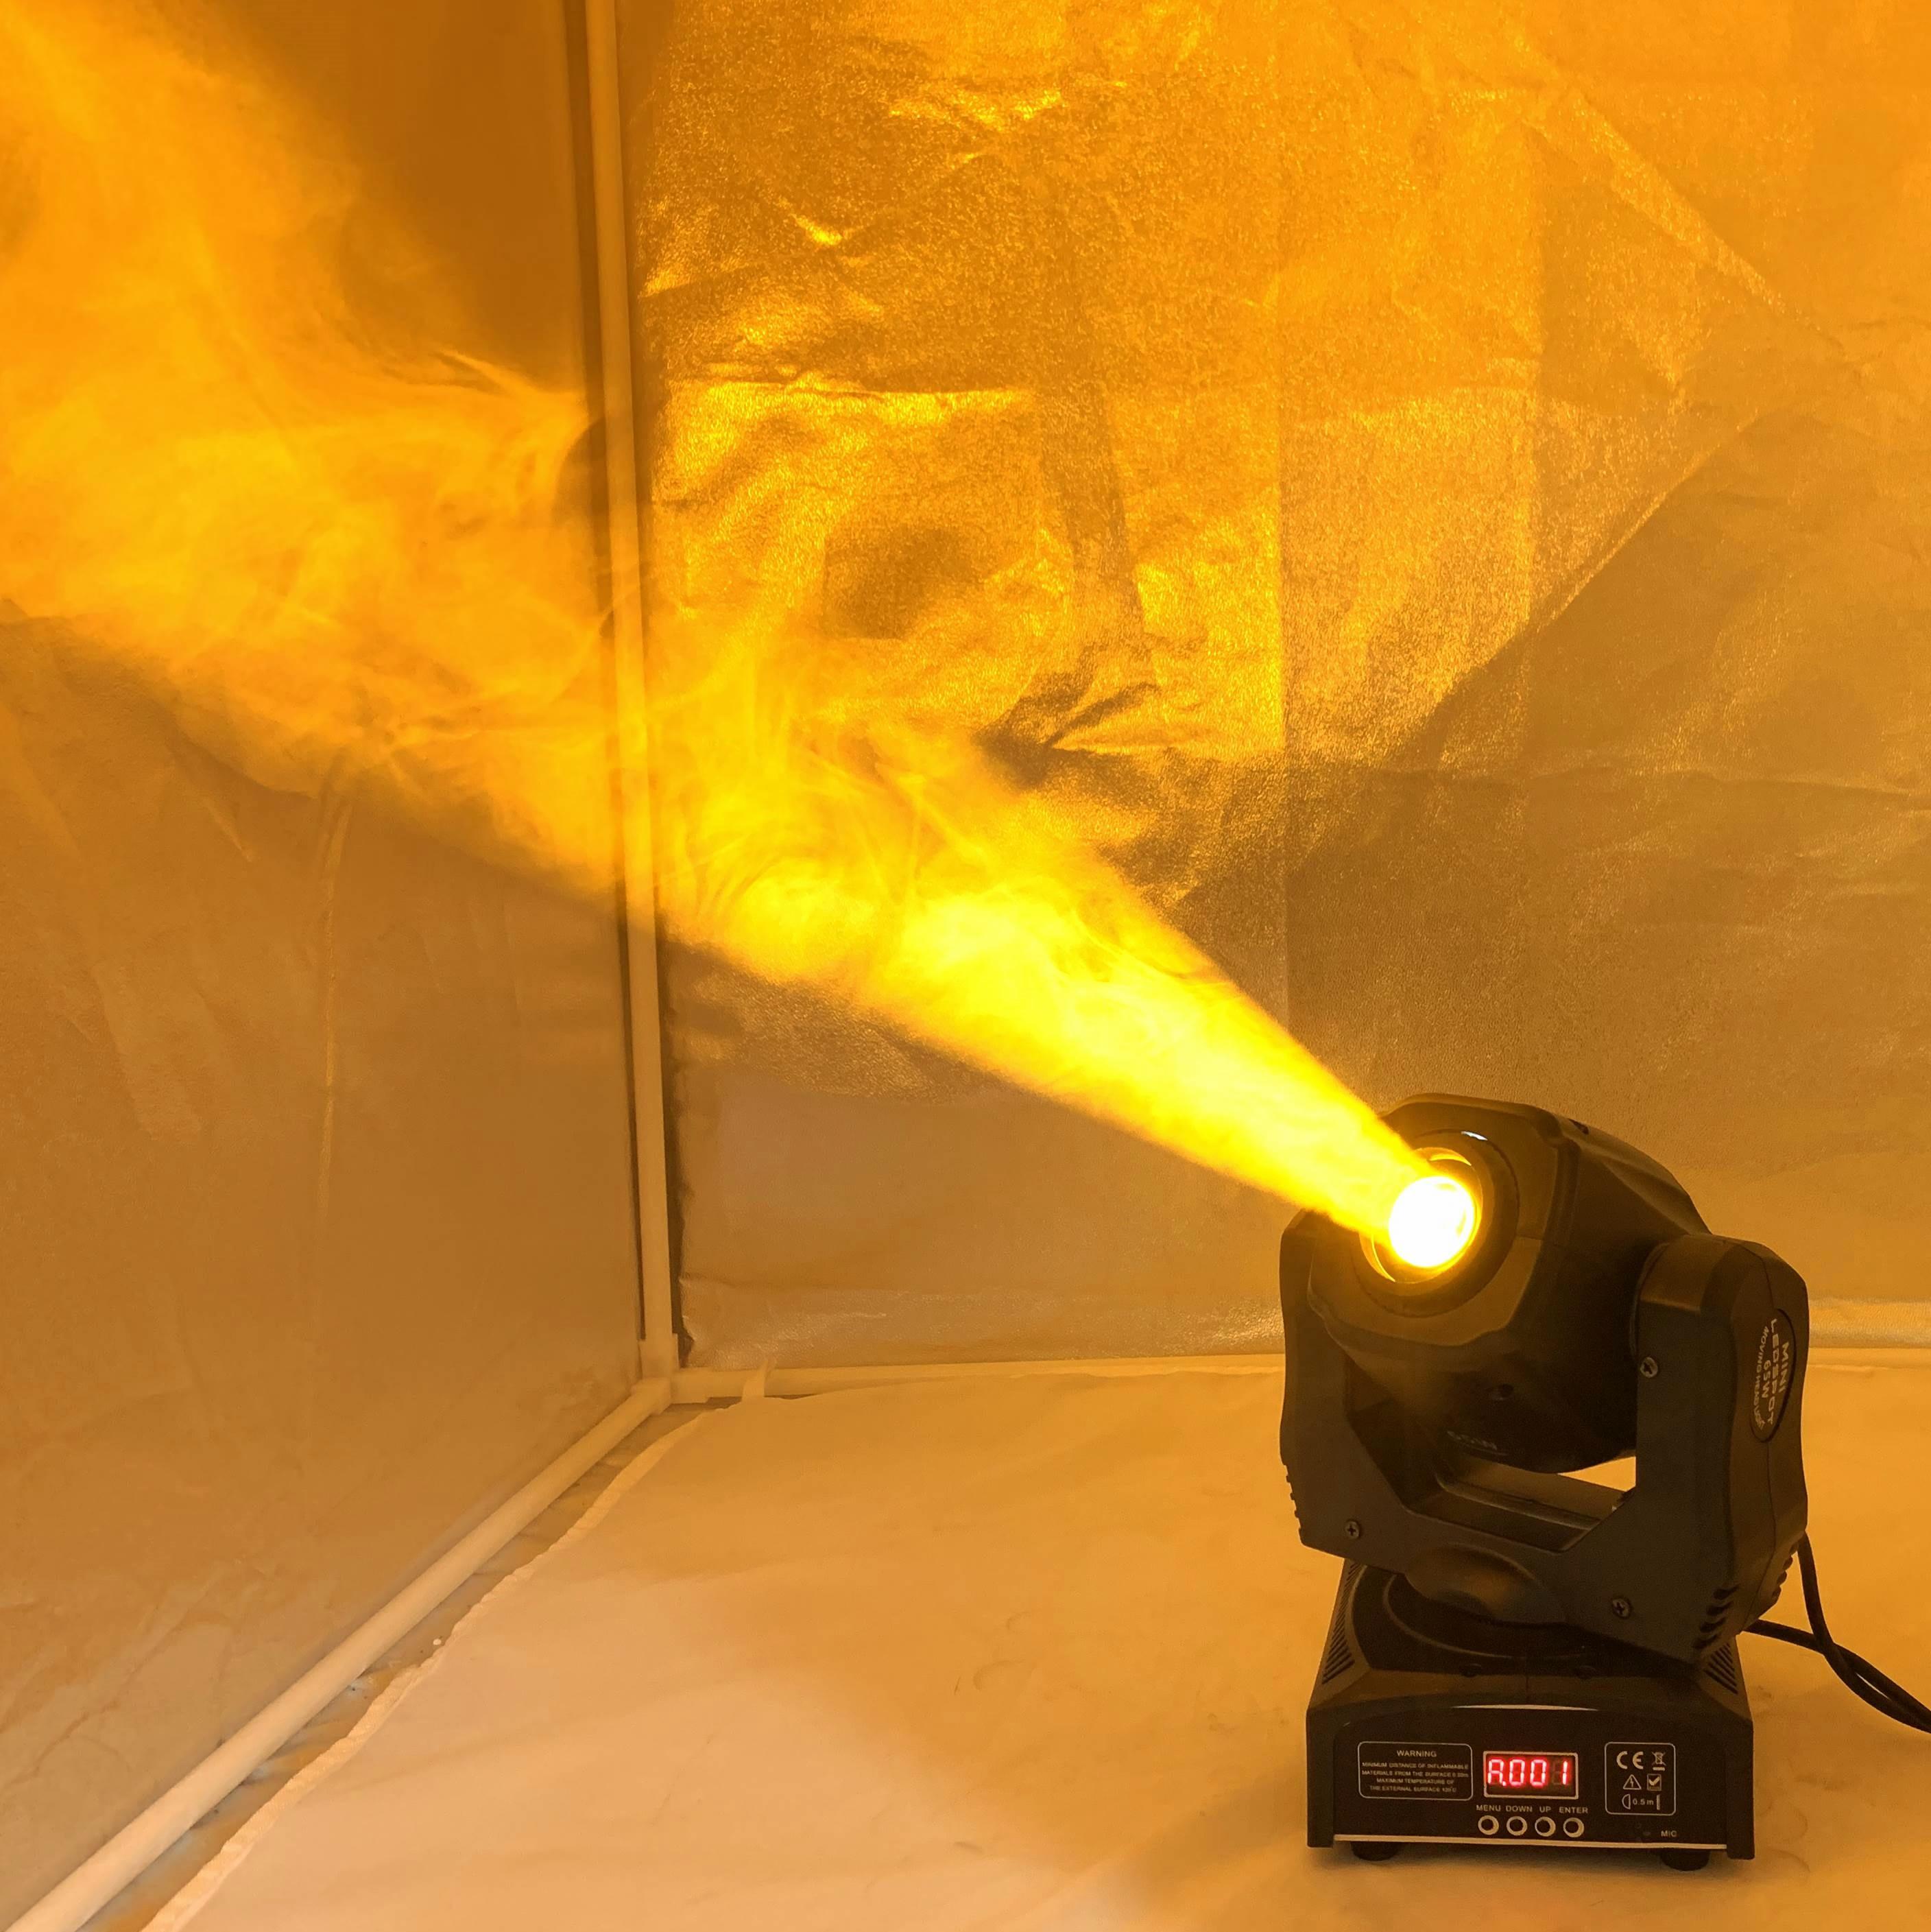 LED Spot luz con cabezal móvil/EE. UU. Luminums foco led para dj luz 65W gobo LED DJ escáneres super brillante LED dj discoteca Luz